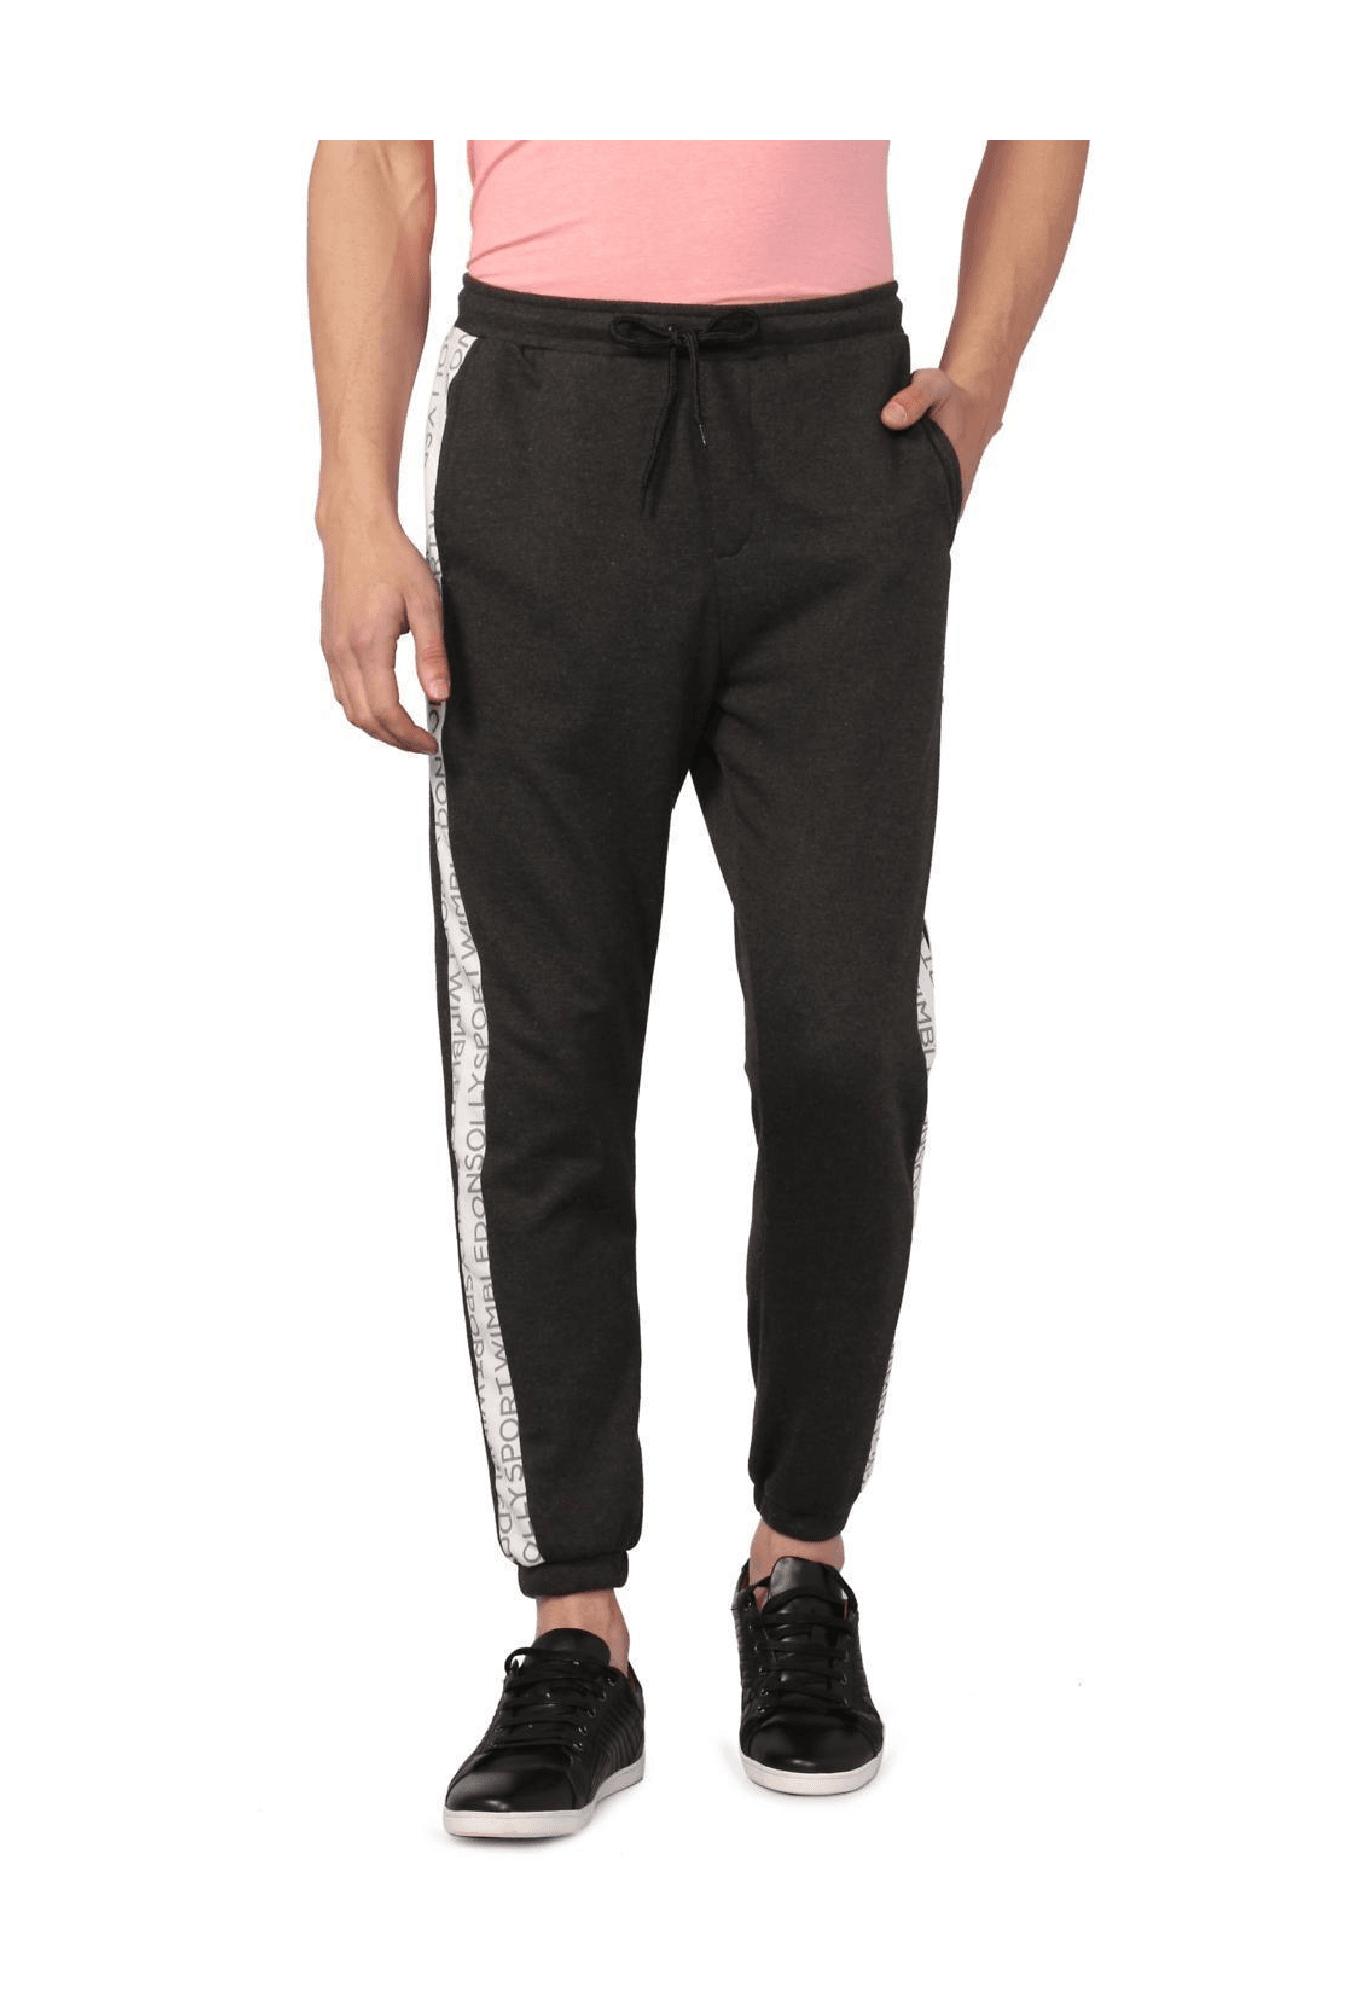 3681071950a Allen Solly Grey Regular Fit Cotton Joggers -